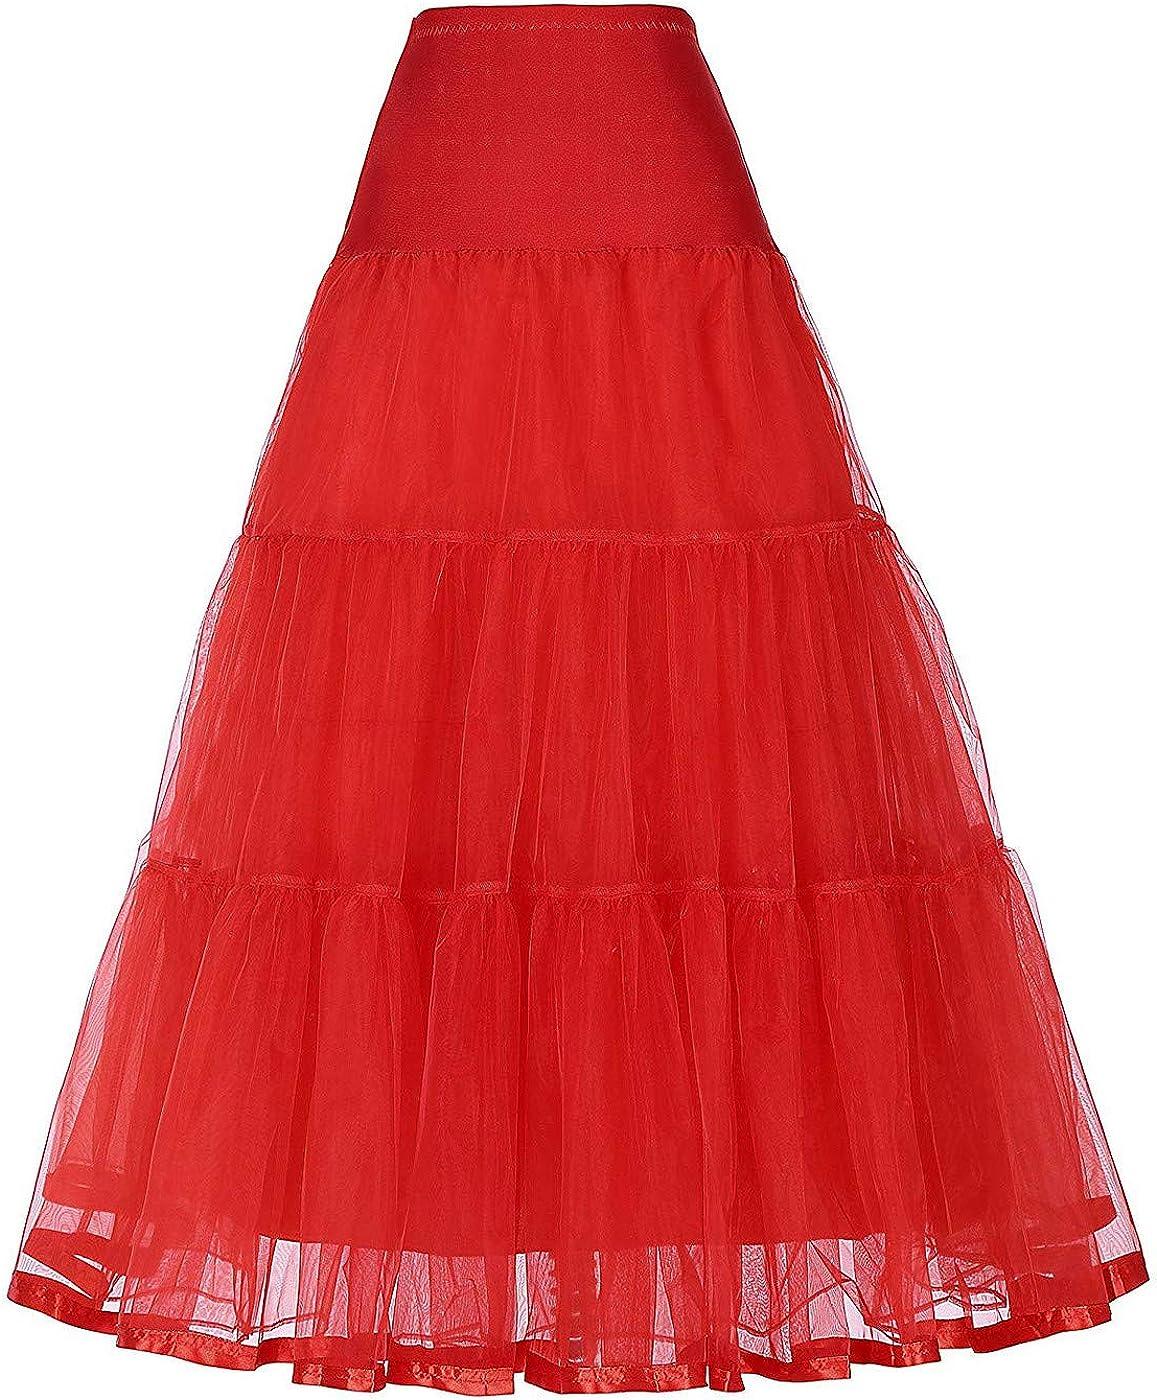 HaoHuodress Donna Sottogonna 50s Retro Gonna Lunga di Tulle Elastico in Vita Crinoline Petticoat